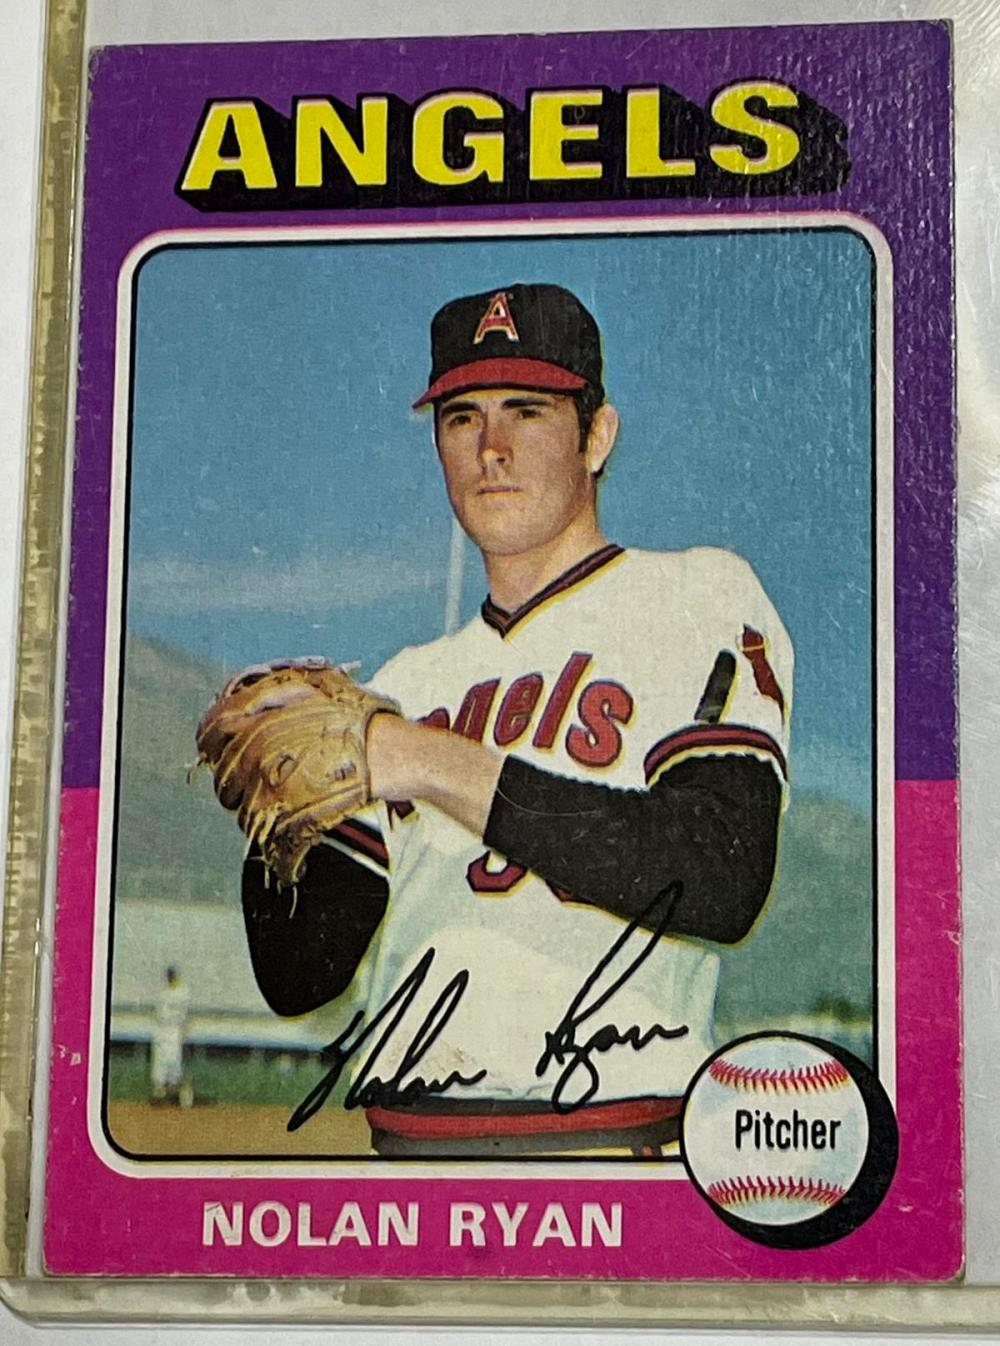 1975 Topps #500 Nolan Ryan California Angels Baseball Card